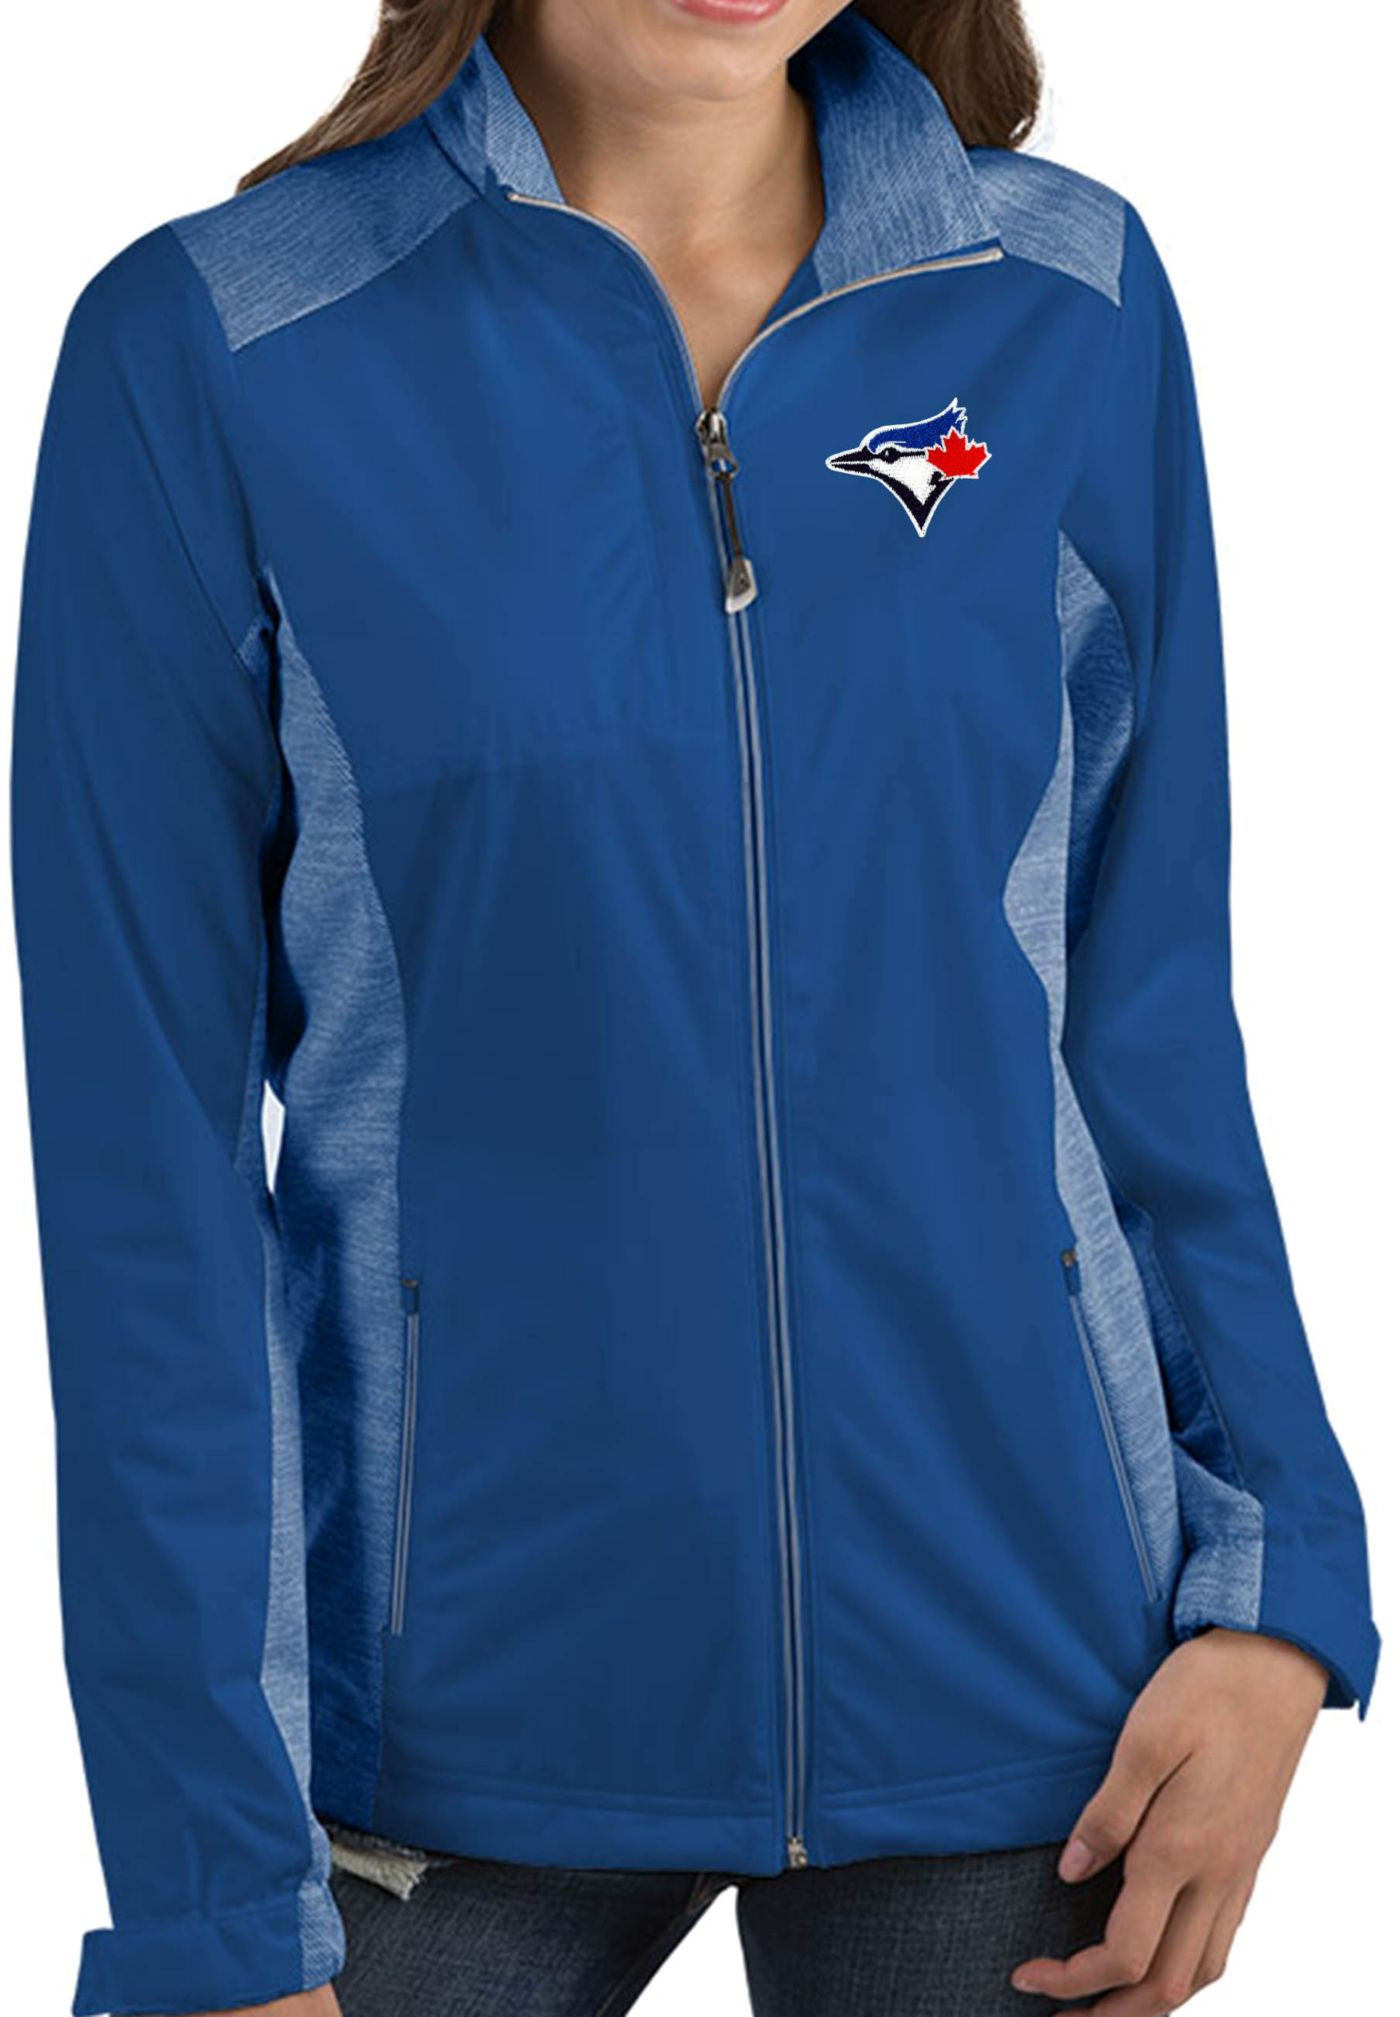 Antigua Women's Toronto Blue Jays Revolve Royal Full-Zip Jacket